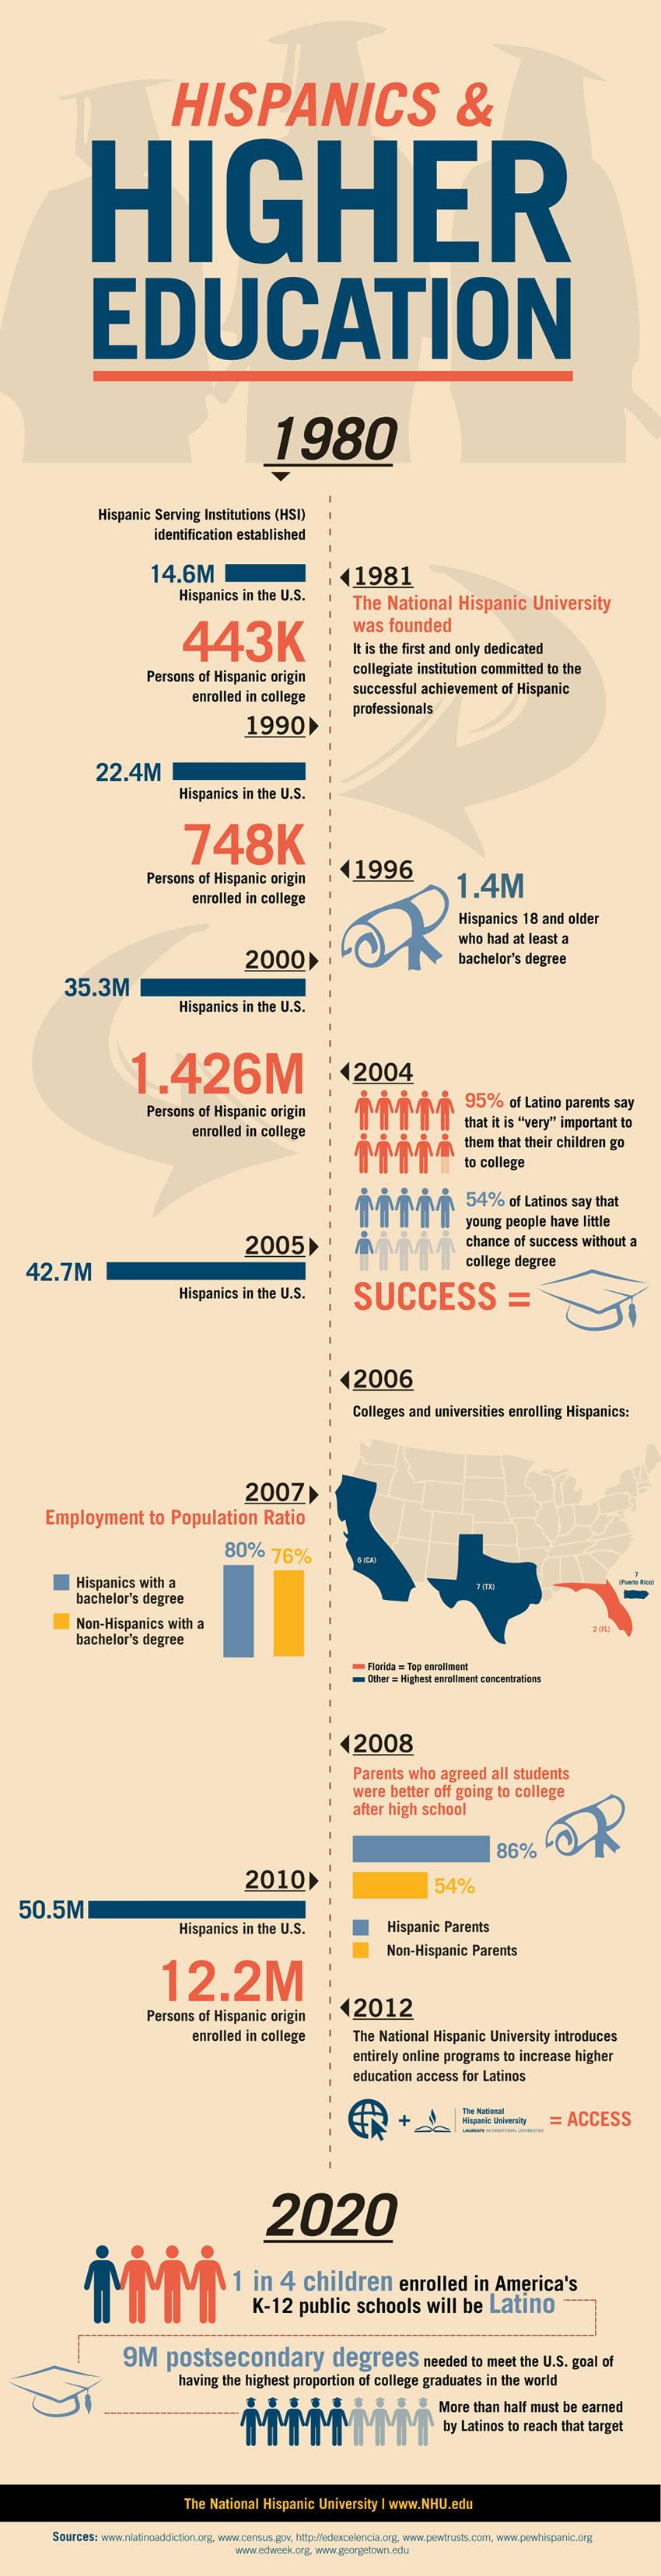 hispanics-and-higher-education-infographic[1]